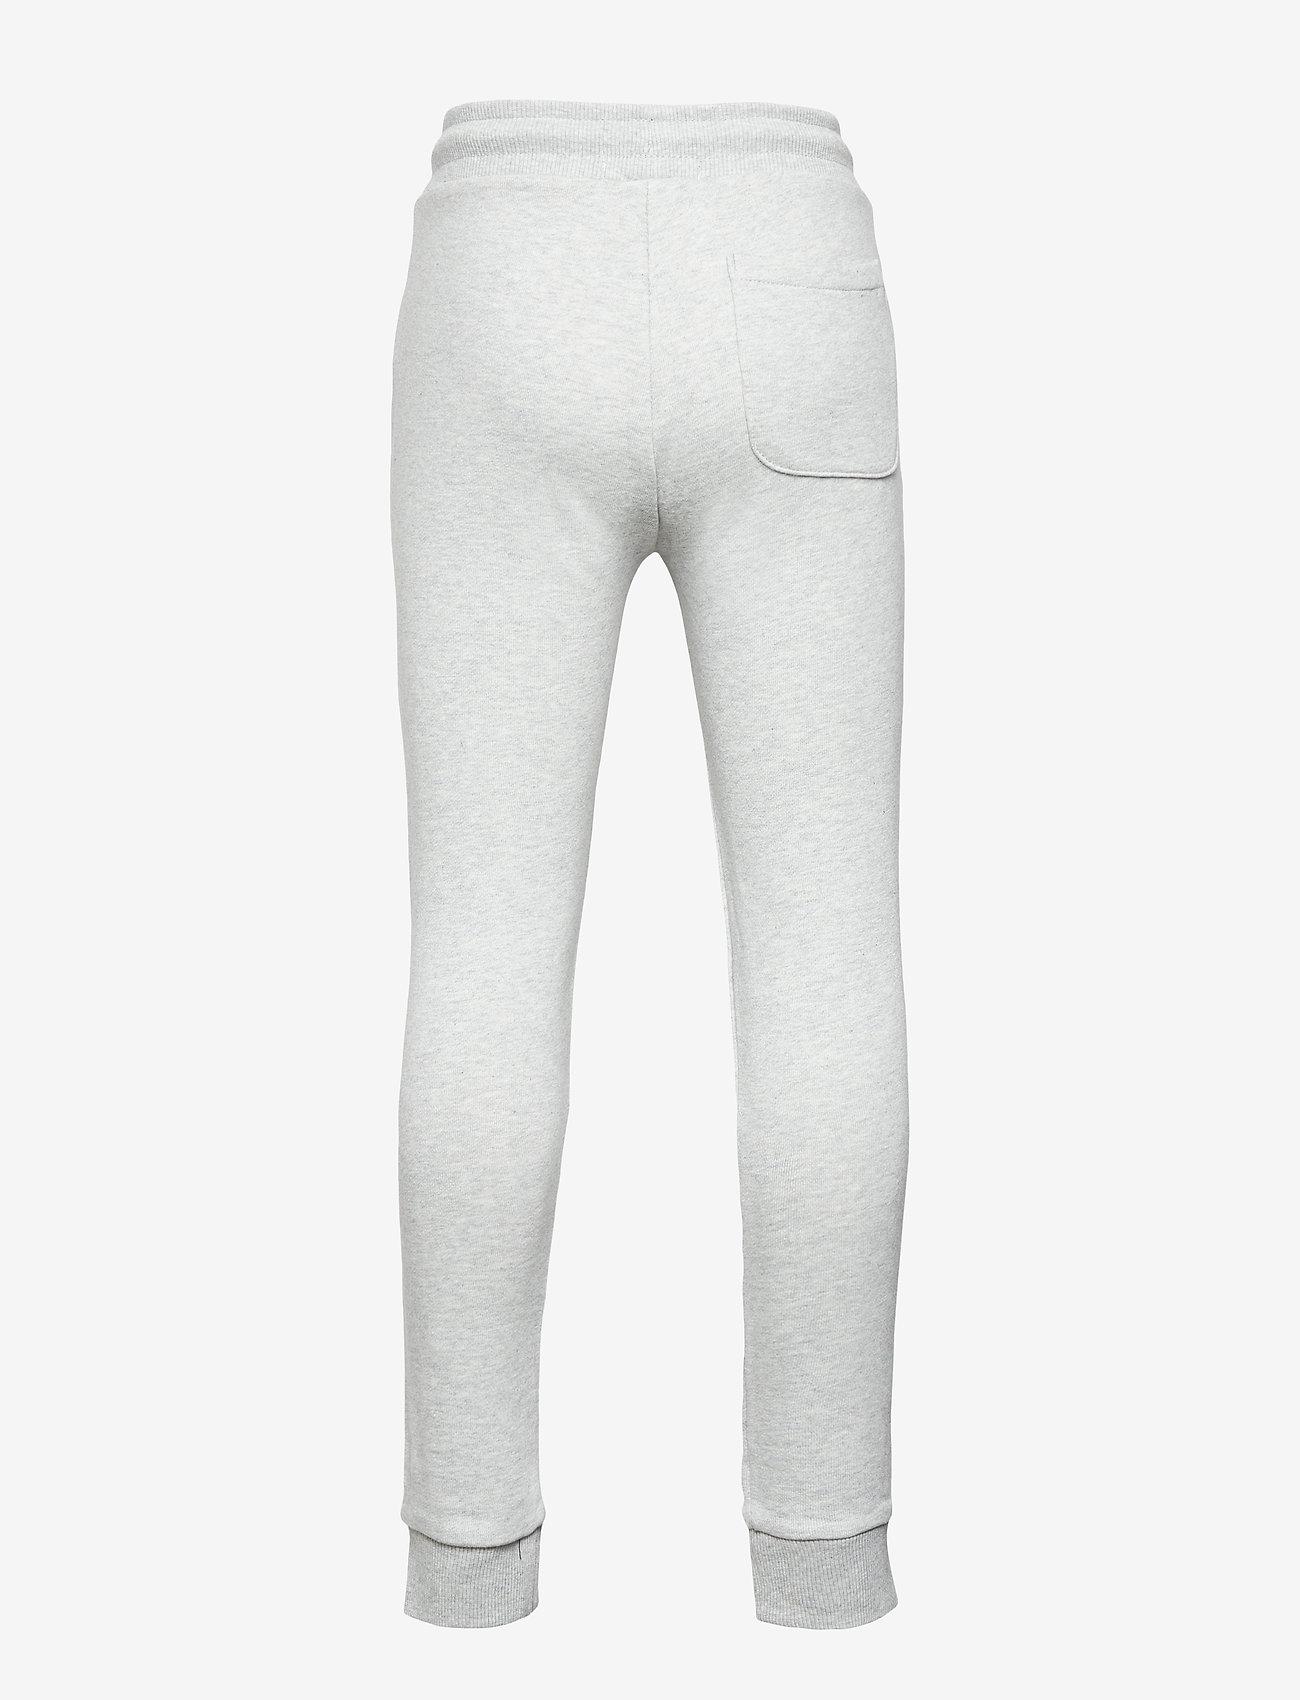 Calvin Klein - REFLECTIVE LOGO SLIM FIT PANTS - jogginghosen - light grey heather - 1